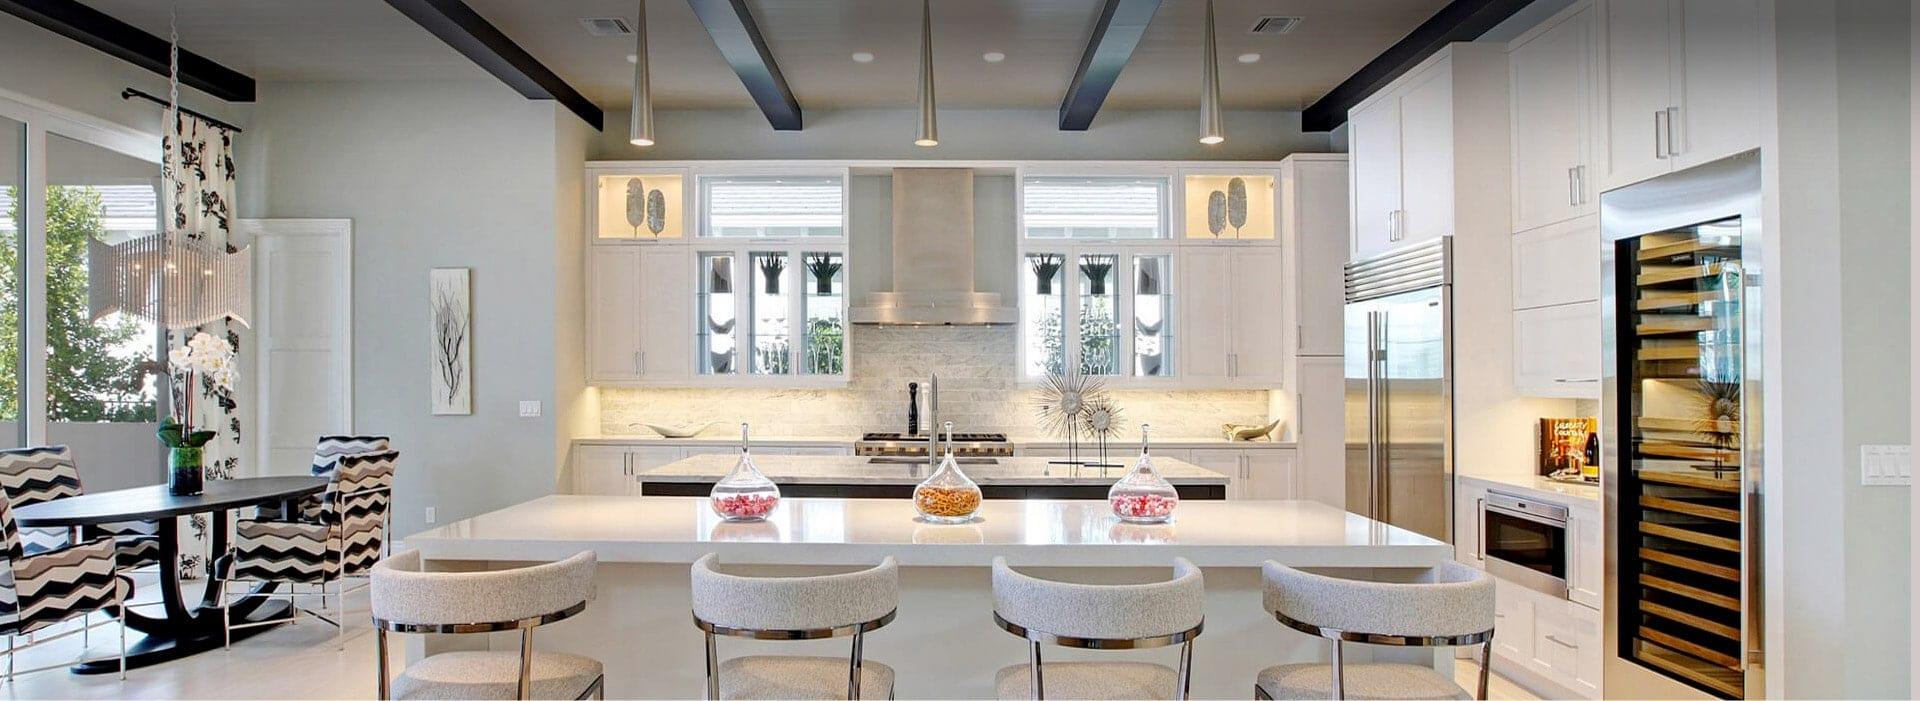 Hasey Homes Kitchen Renovation